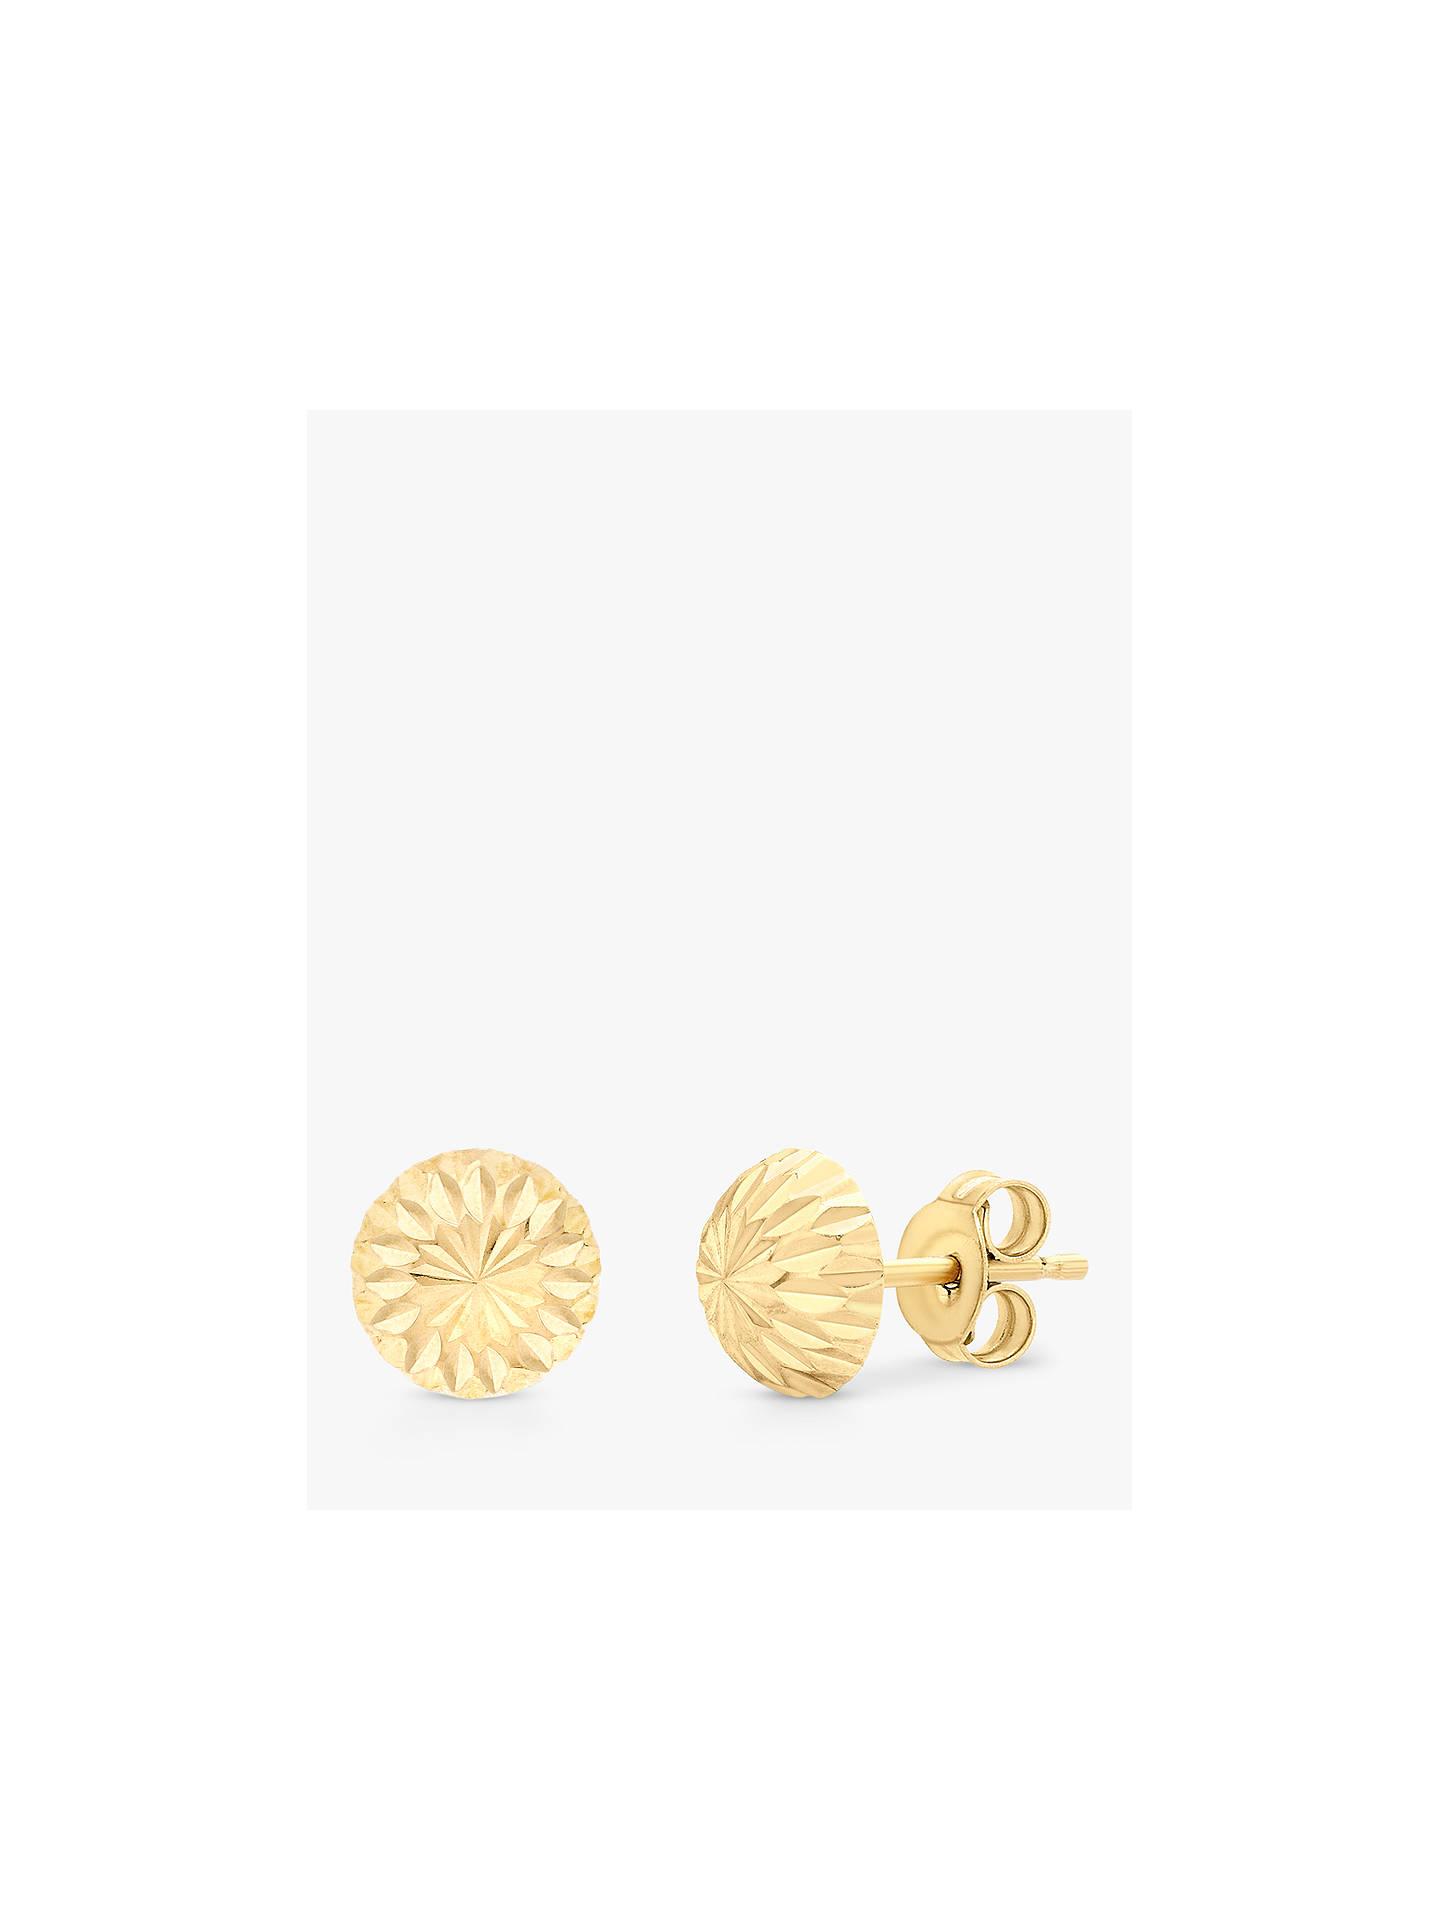 0eb19d18b Buy IBB 9ct Gold Diamond Cut Half Ball Stud Earrings, Gold Online at  johnlewis.